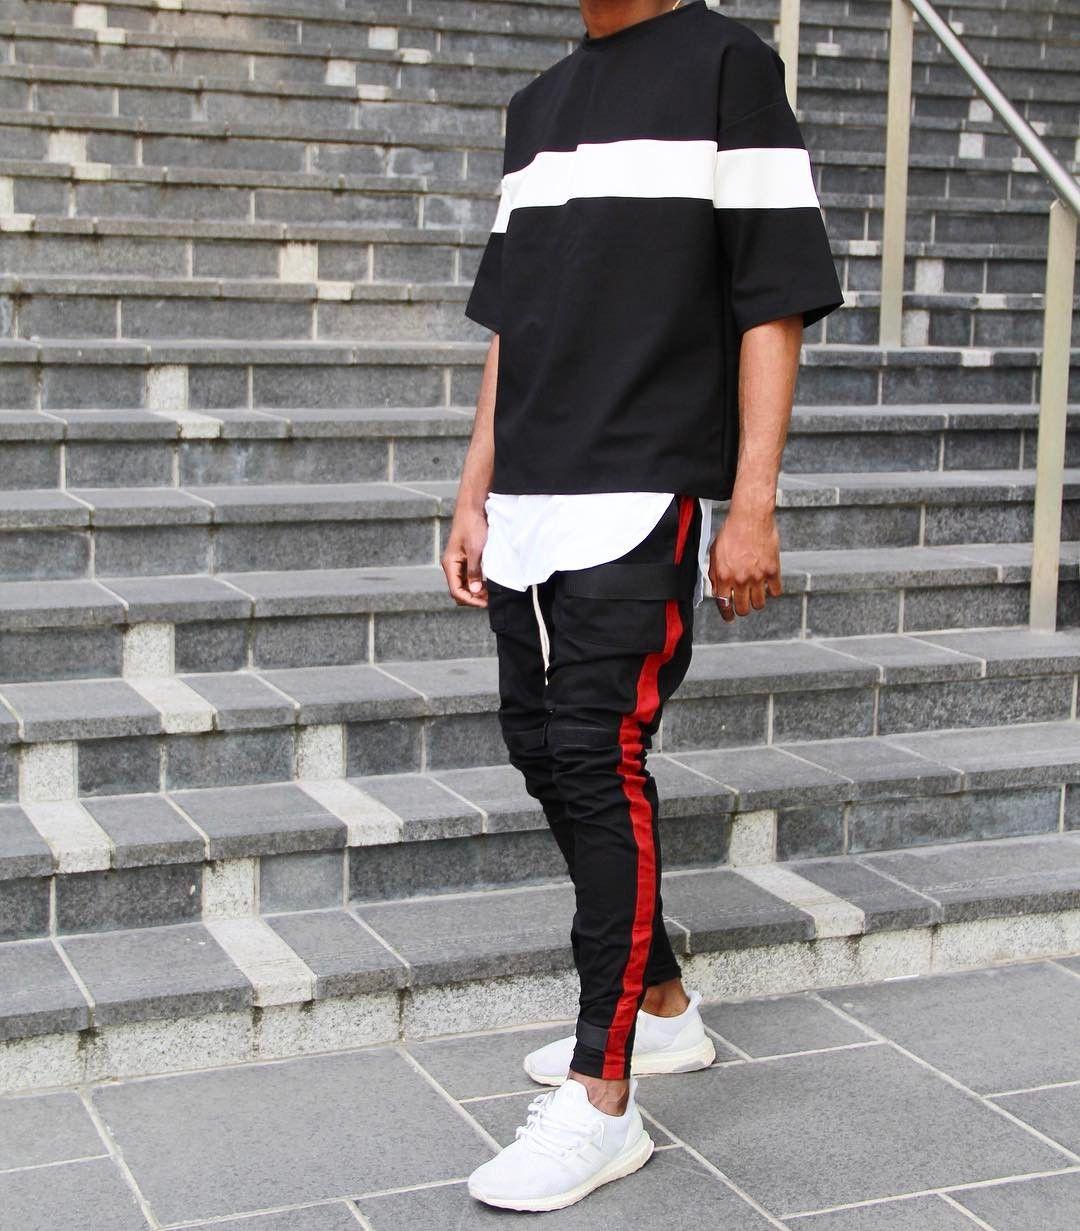 570 Mentions J Aime 12 Commentaires Lespetitesmesures Sur Instagram Atelier Lpm Fr Pro Streetwear Fashion Daily Fashion Inspiration Star Clothing